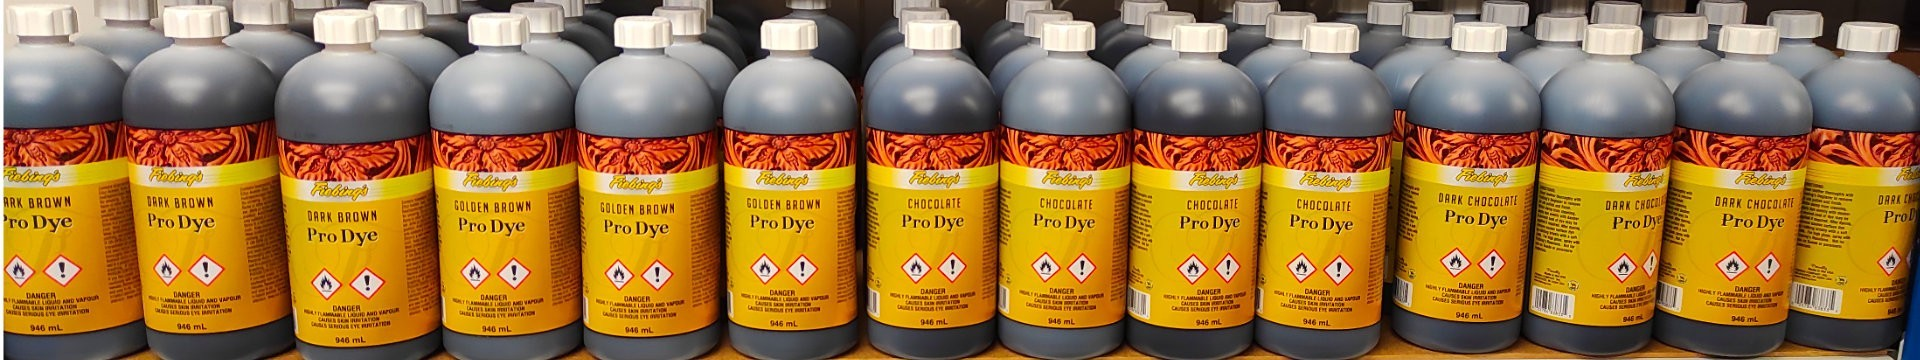 Professional Oil Dye